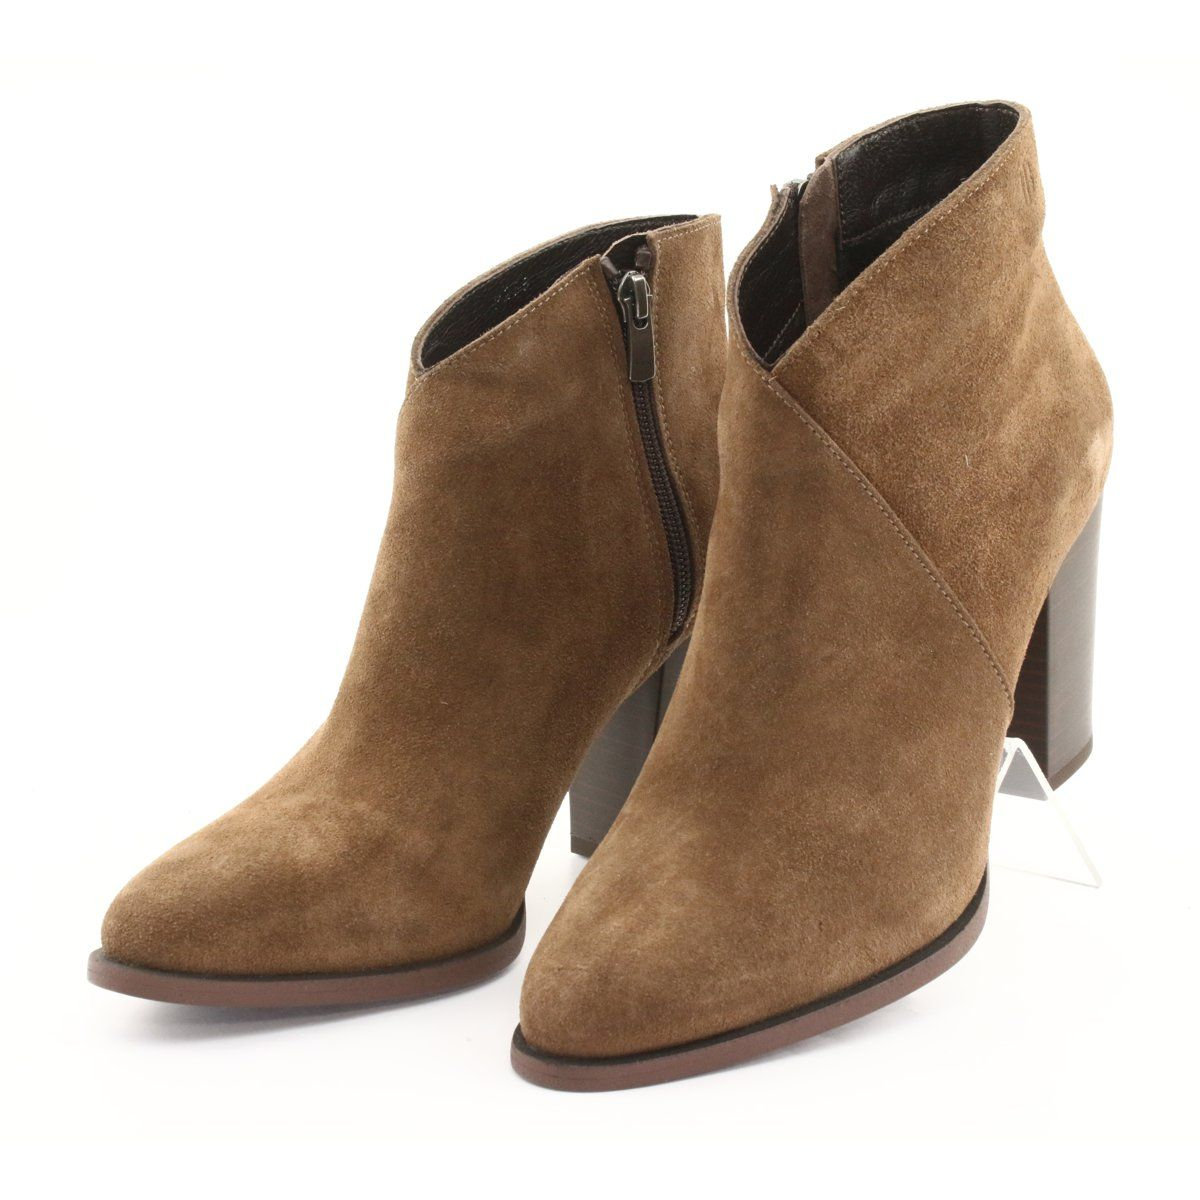 Badura Zamszowe Botki Na Slupku Brazowe Ankle Boot Shoes Boots